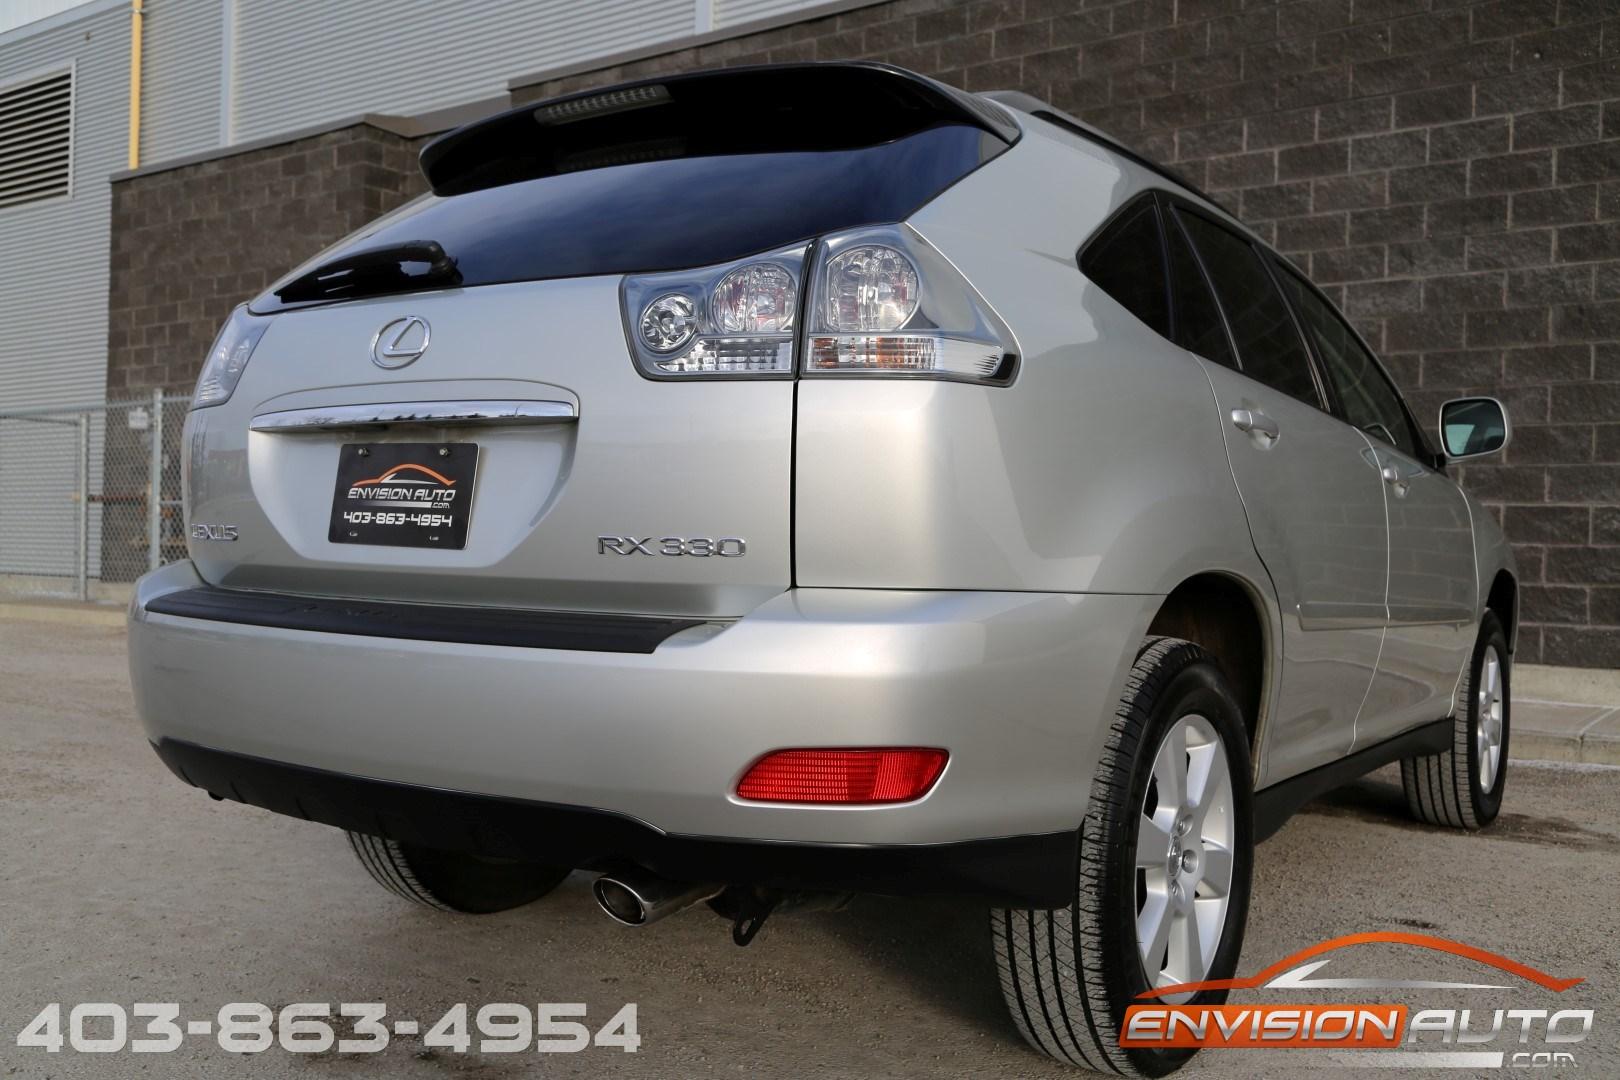 2005 lexus rx330 awd premium envision auto. Black Bedroom Furniture Sets. Home Design Ideas